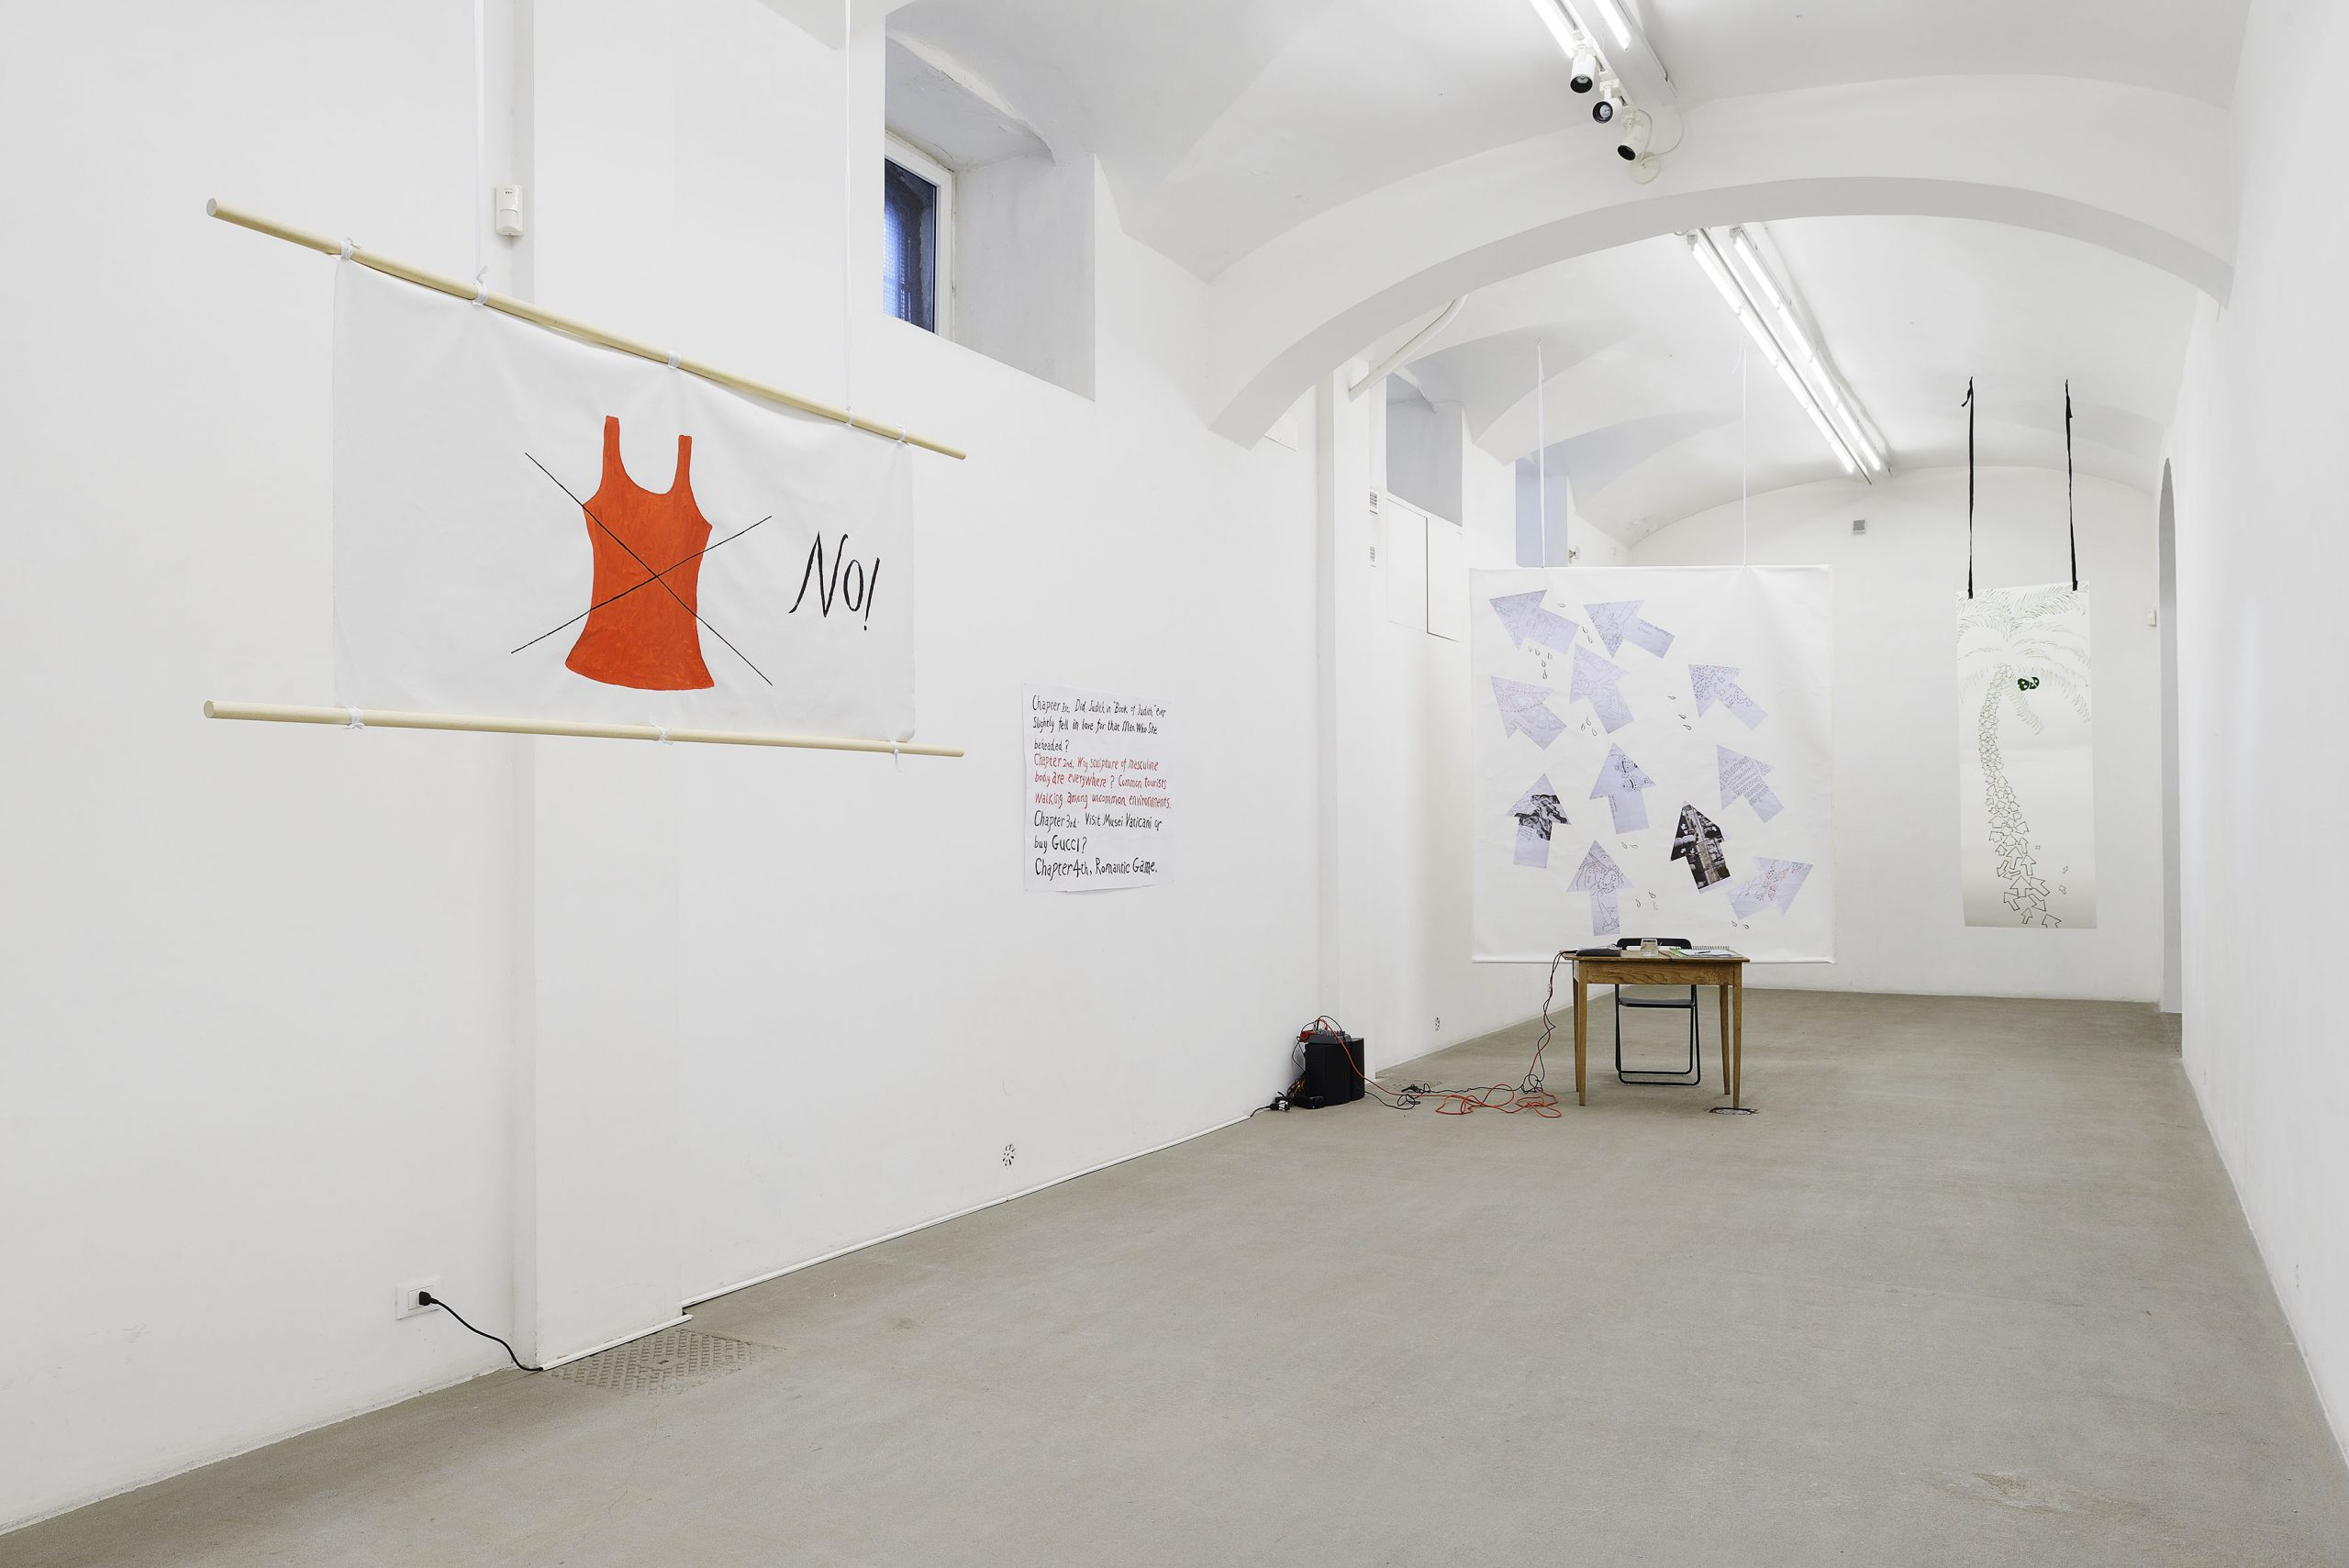 Evelyn Taocheng Wang Idle Chatter, Gossipy Rome, installation view presso Fondazione Giuliani, Roma, 2018  foto Roberto Apa